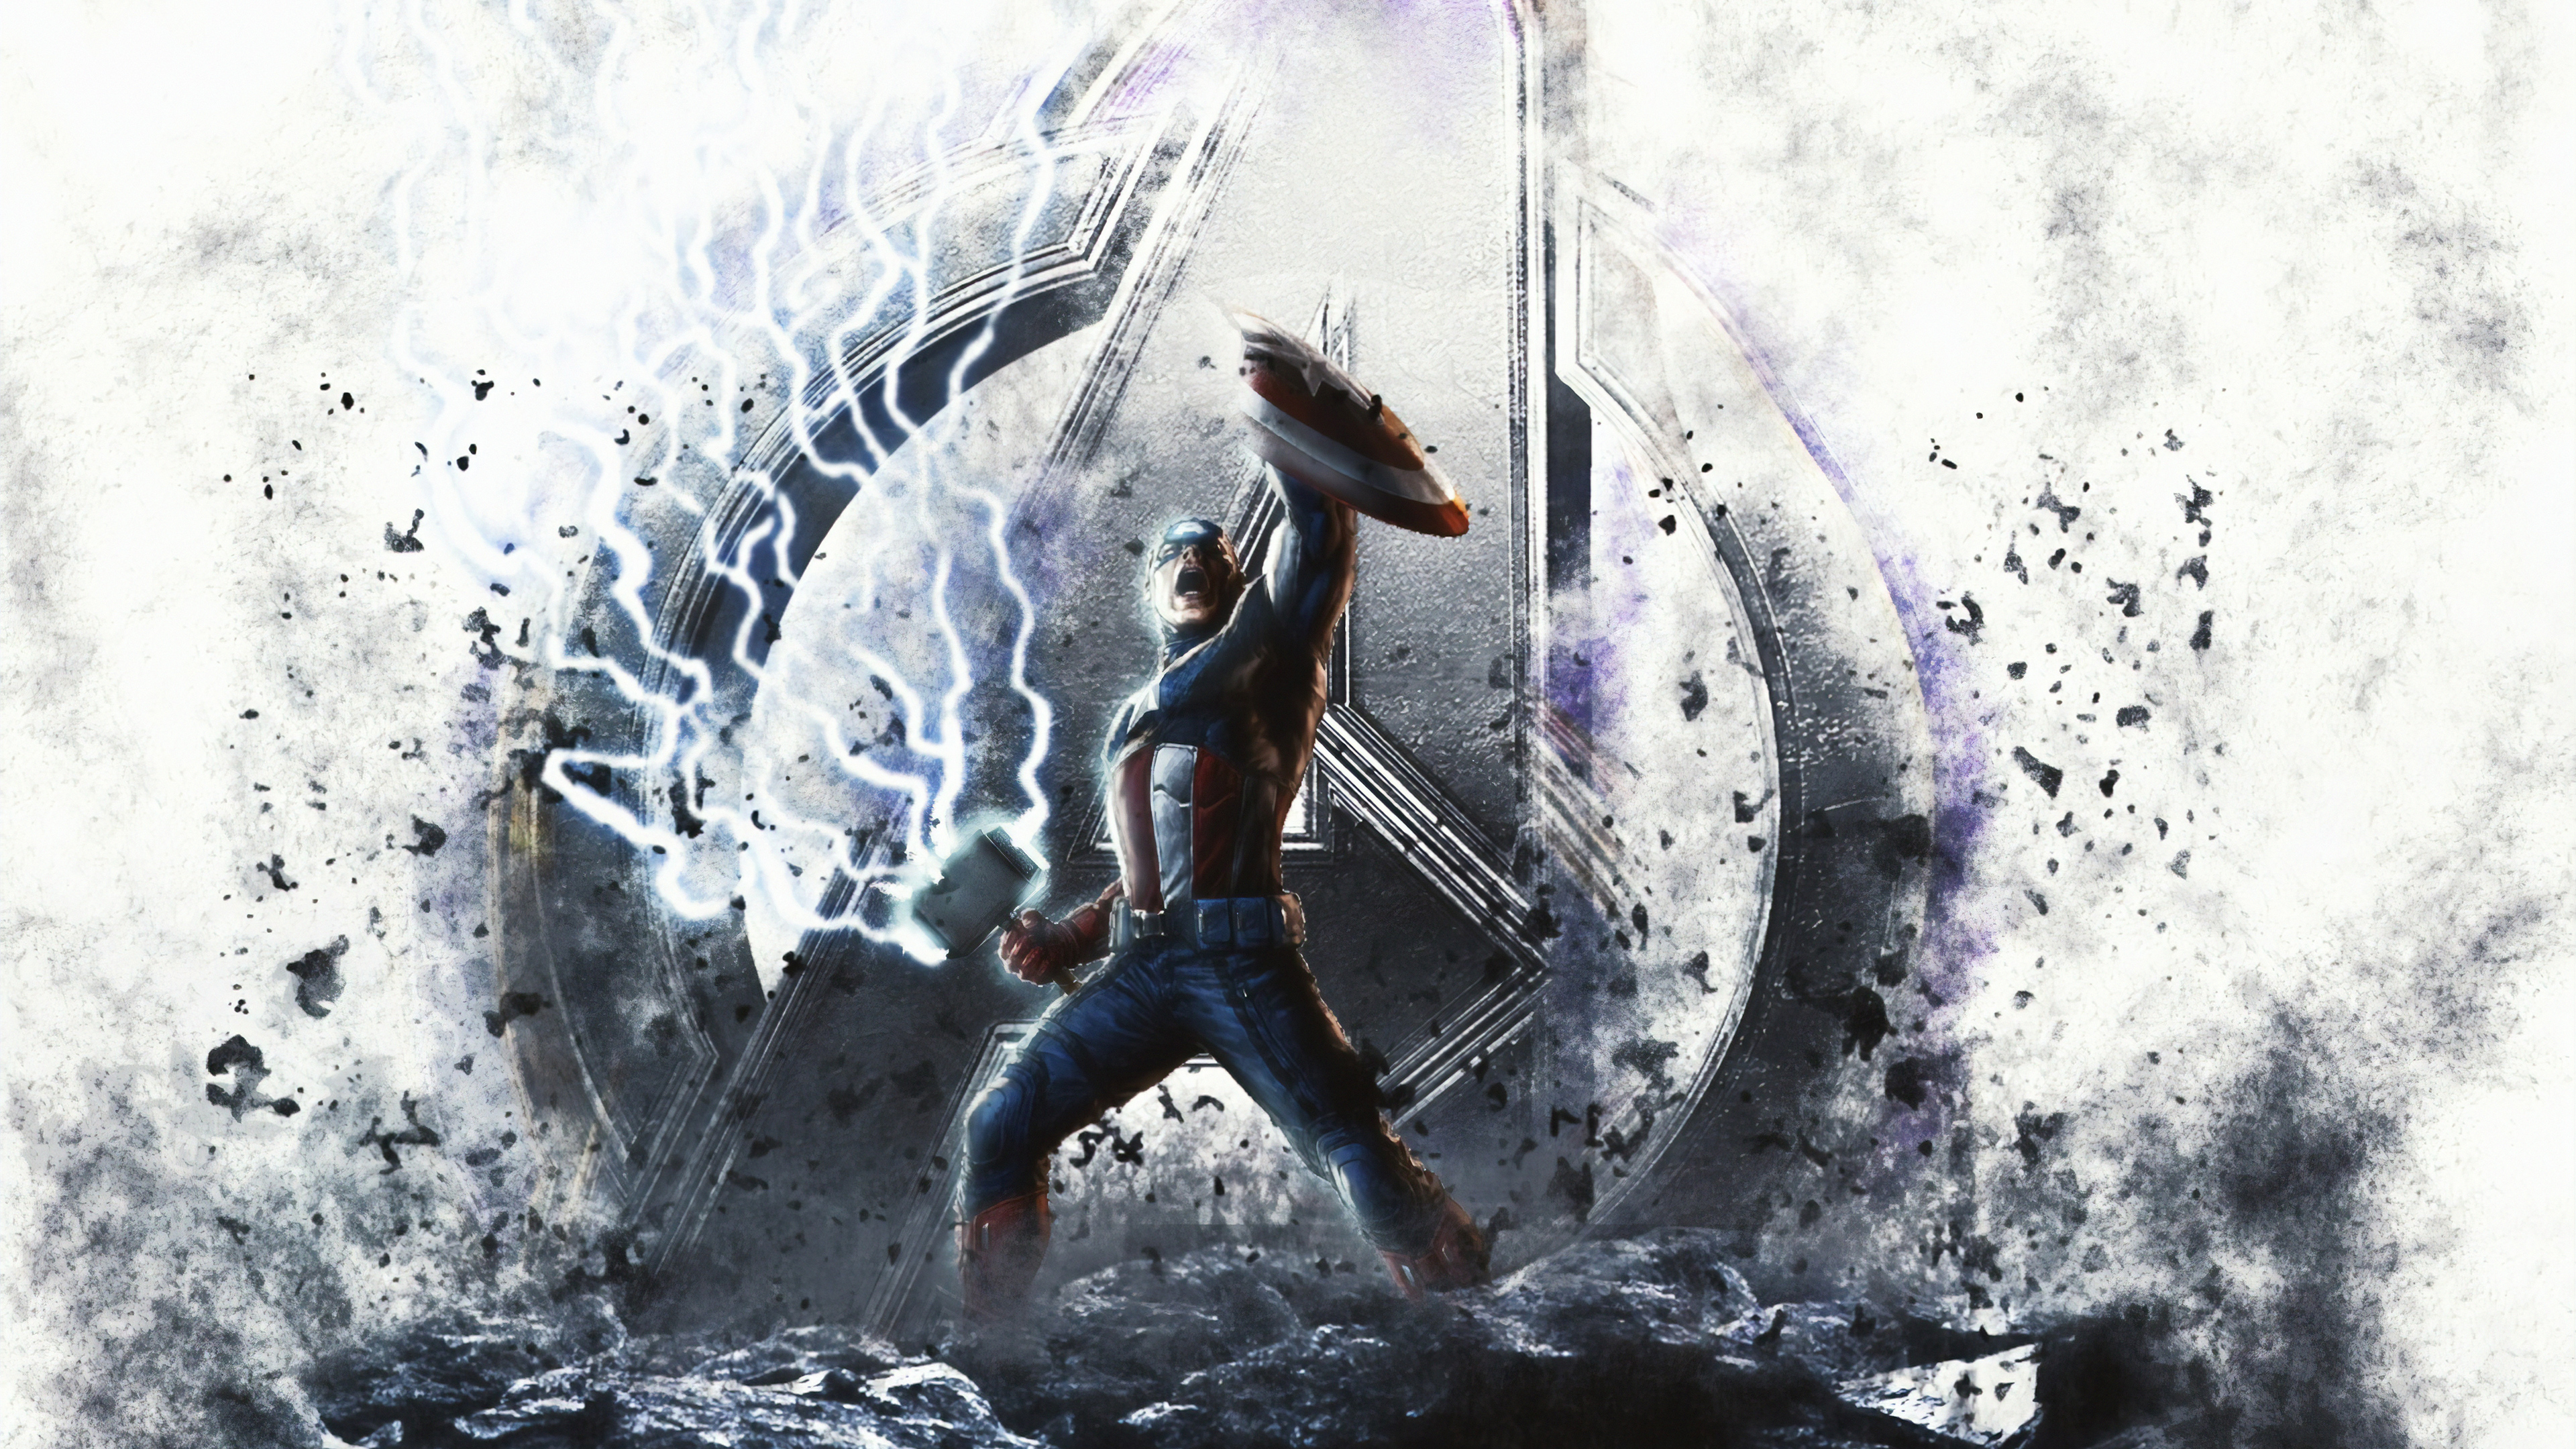 captain america worthy art 1570394318 - Captain America Worthy Art - superheroes wallpapers, hd-wallpapers, captain america wallpapers, artwork wallpapers, 4k-wallpapers